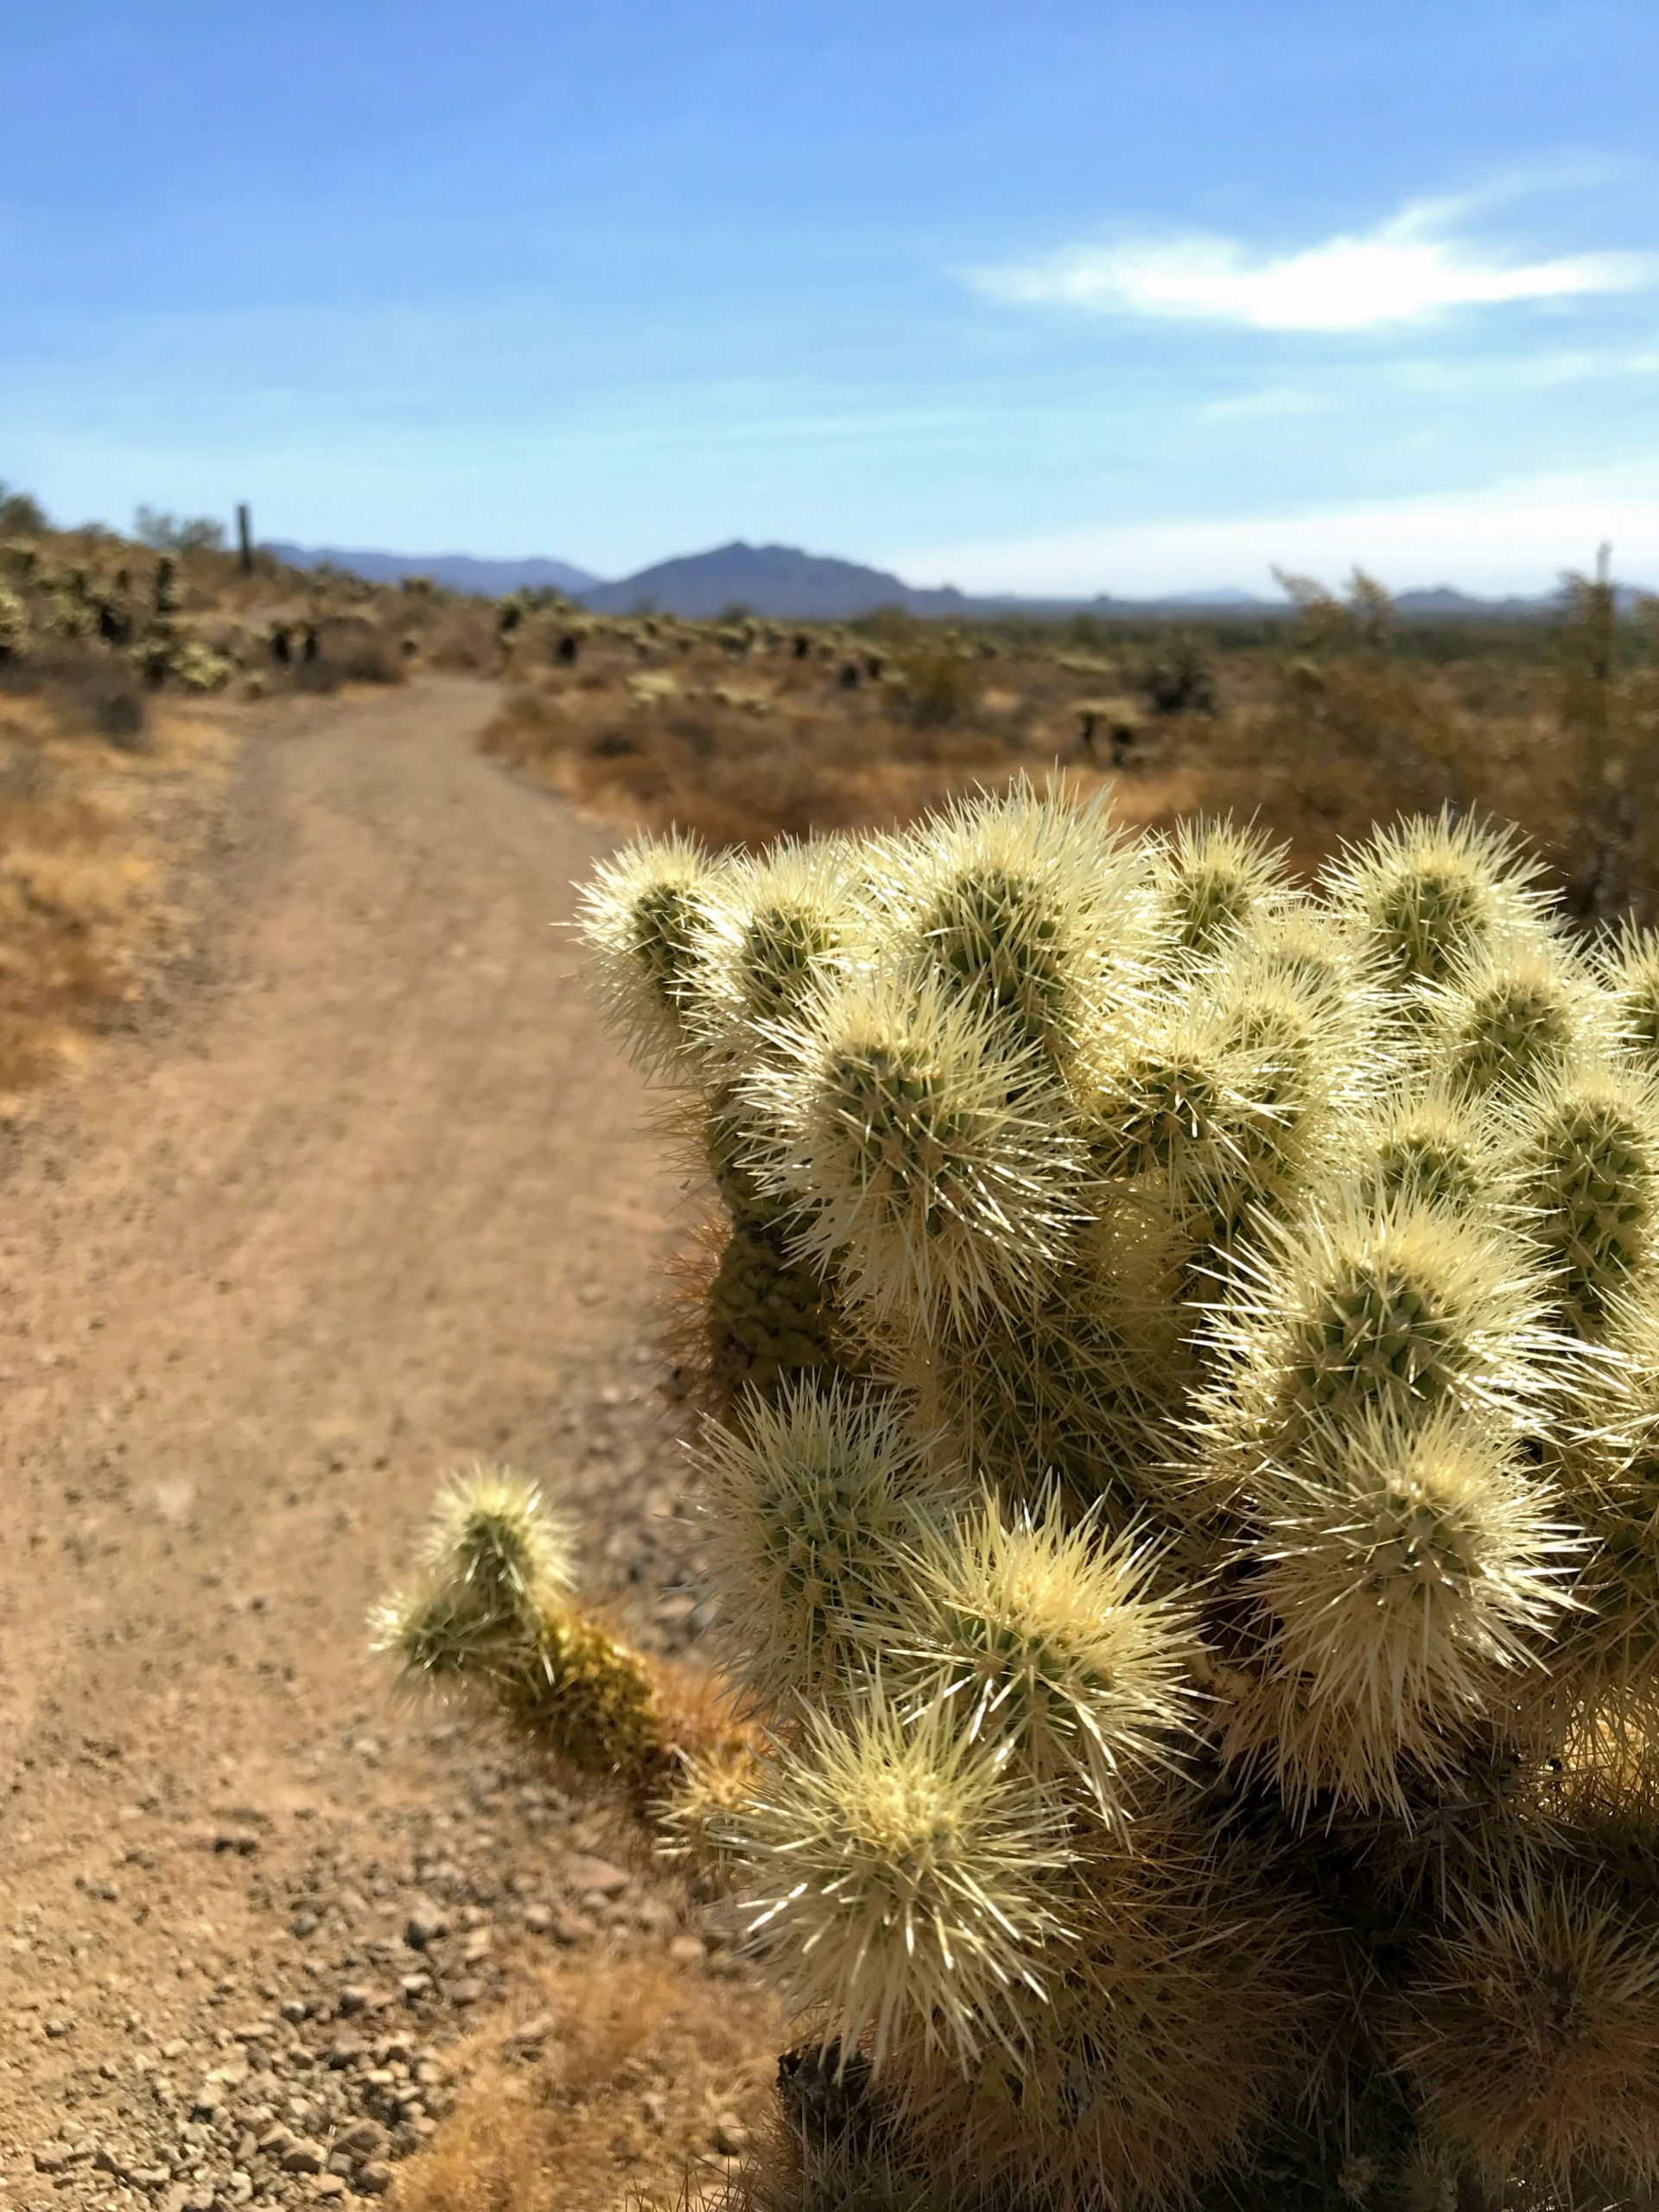 Sidewinder trail hike Phoenix Sonoran Preserve views north